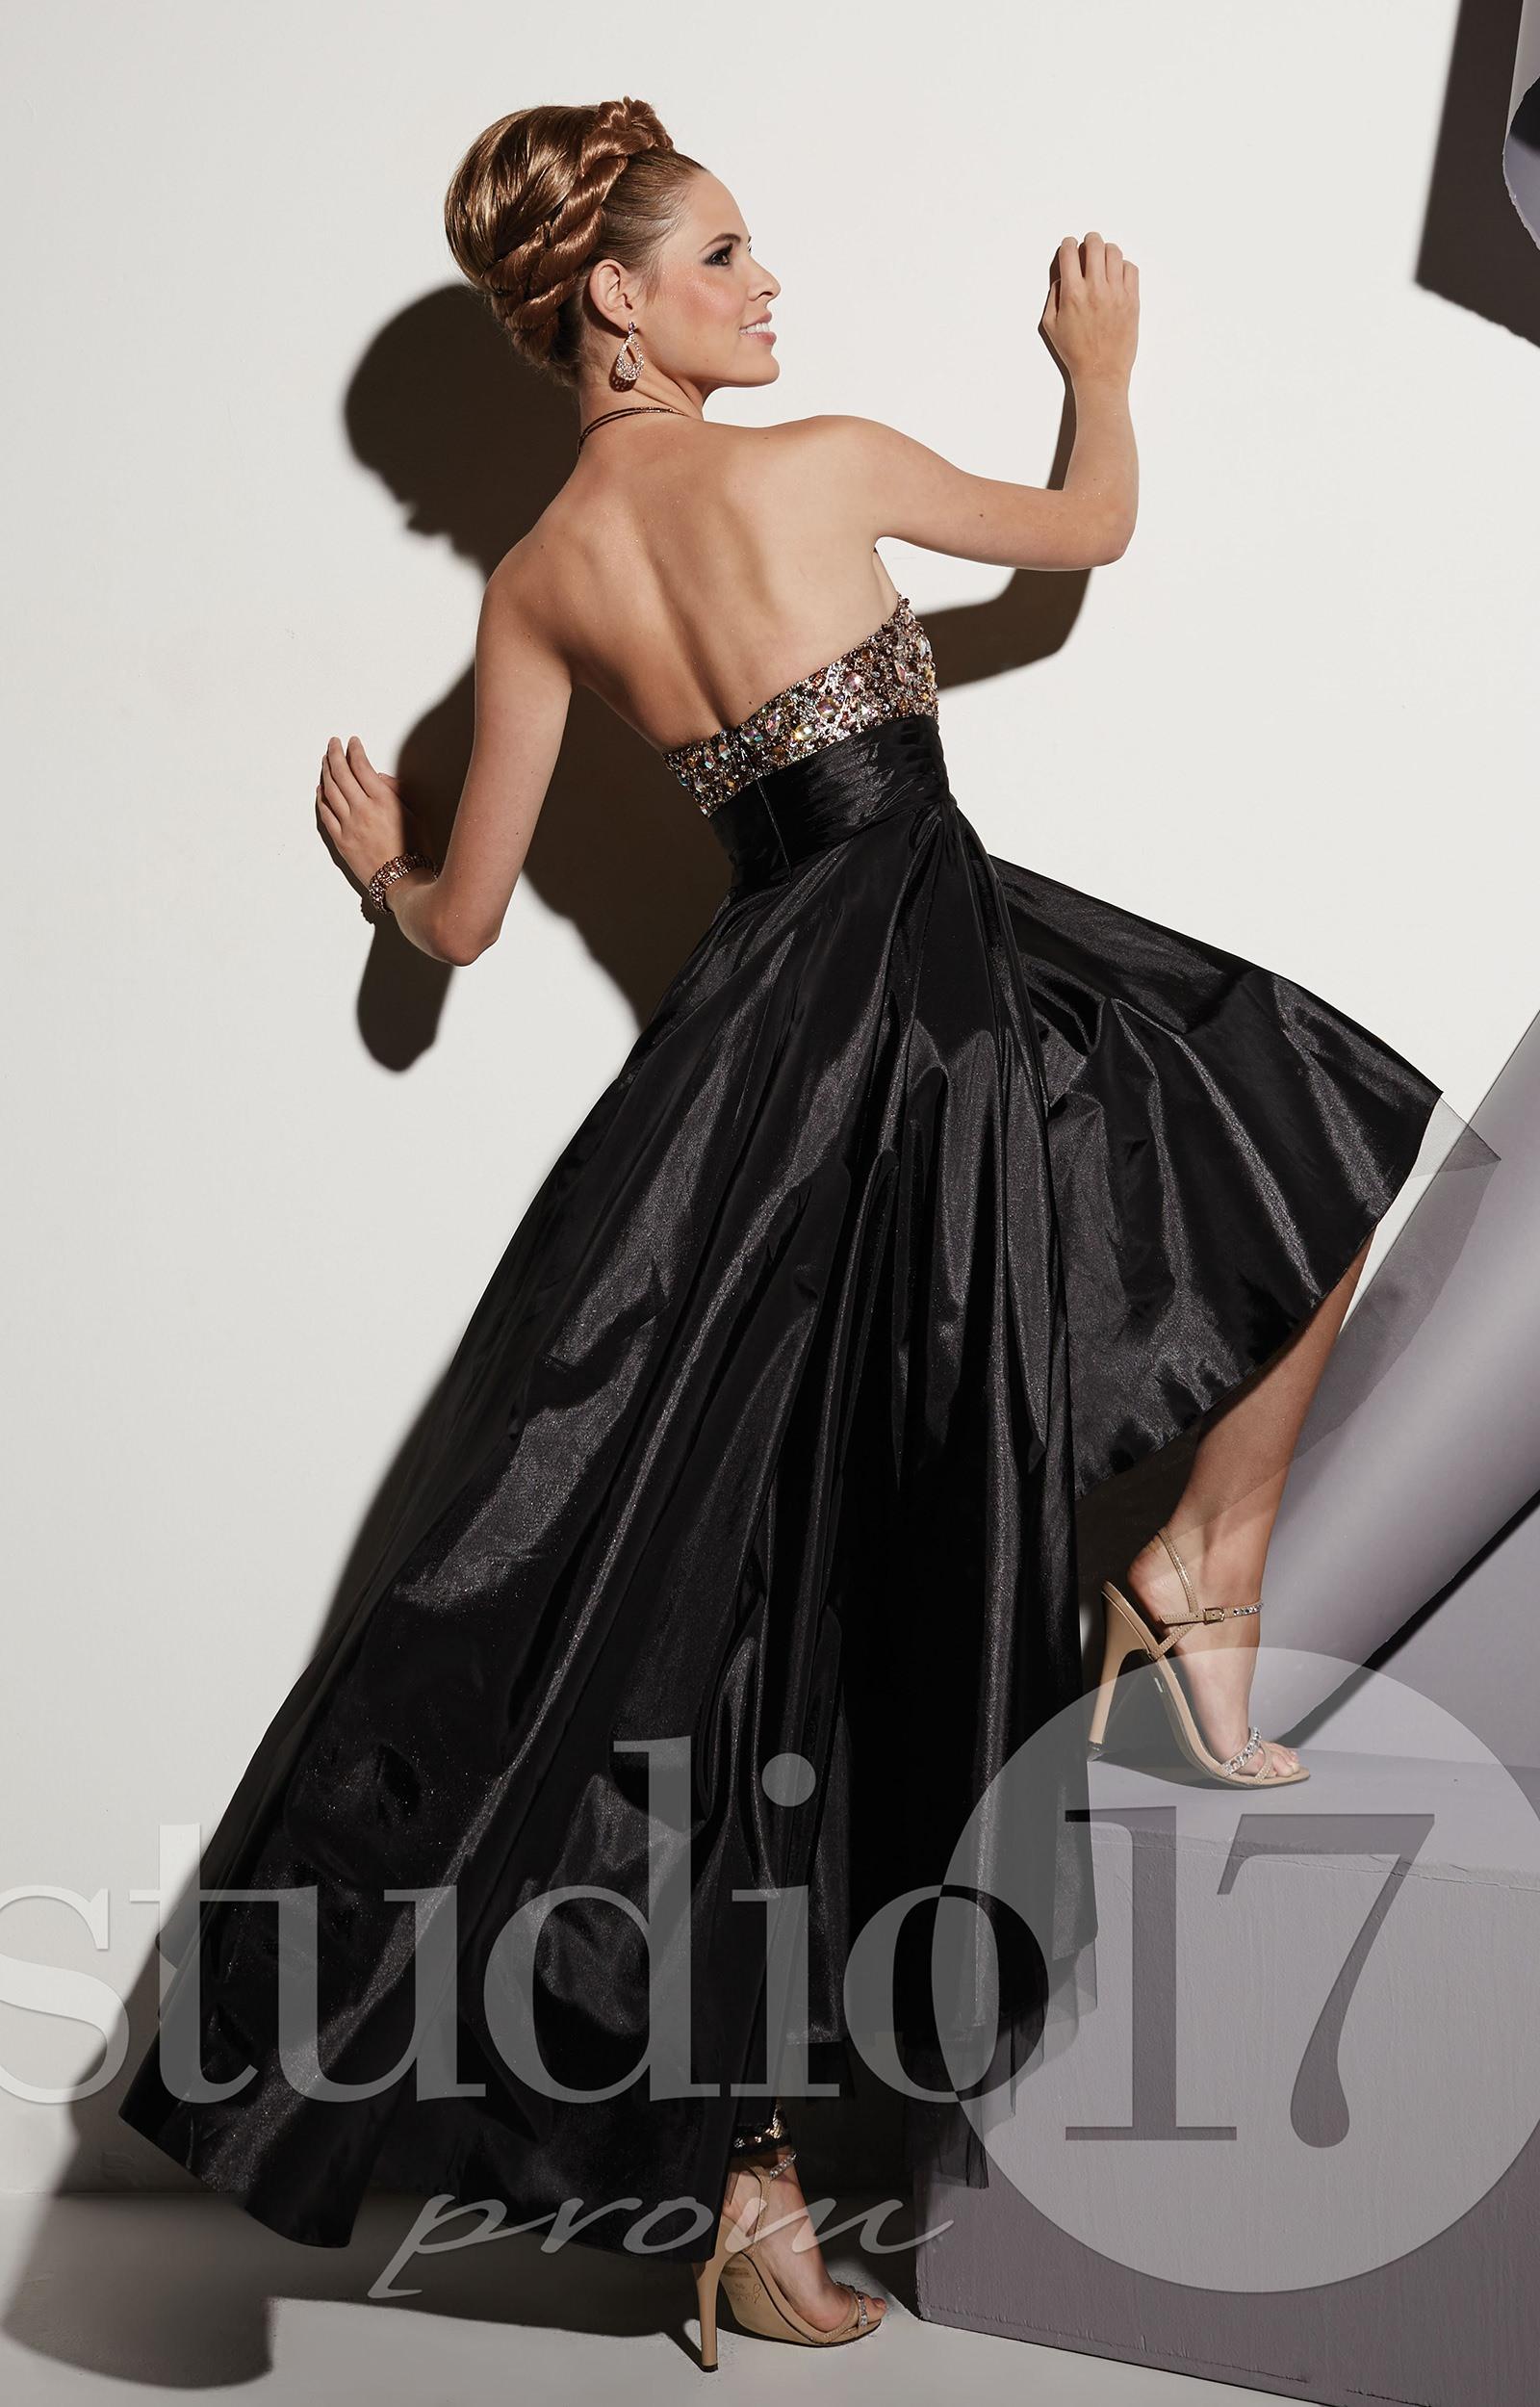 Studio 17 12466 Daring Diva Gown Prom Dress